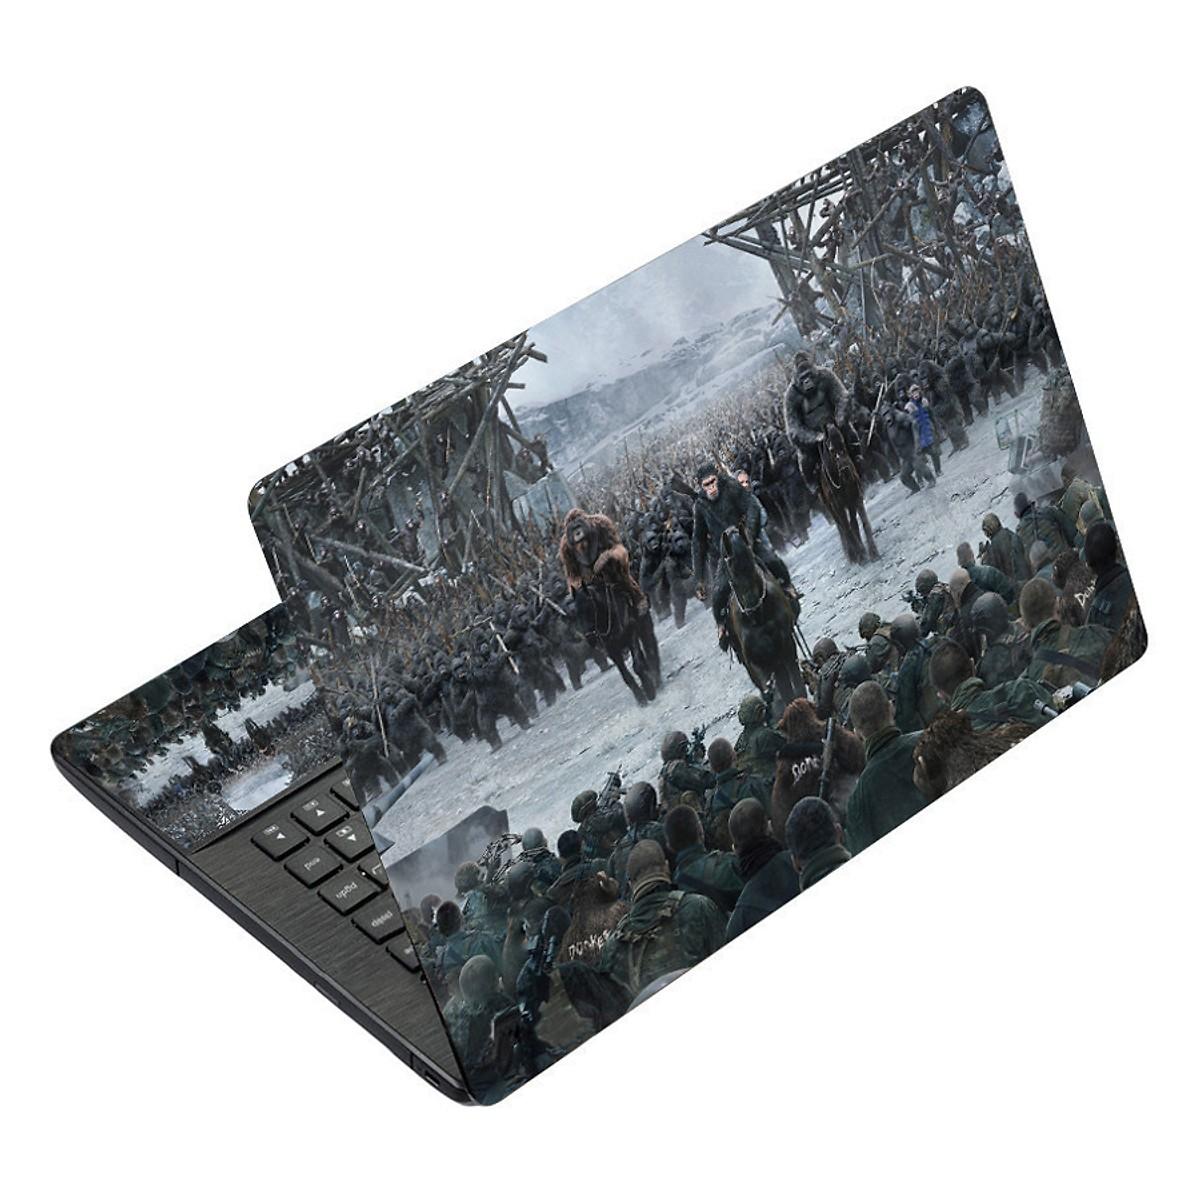 Mẫu Dán Laptop Điện Ảnh LTDA-66